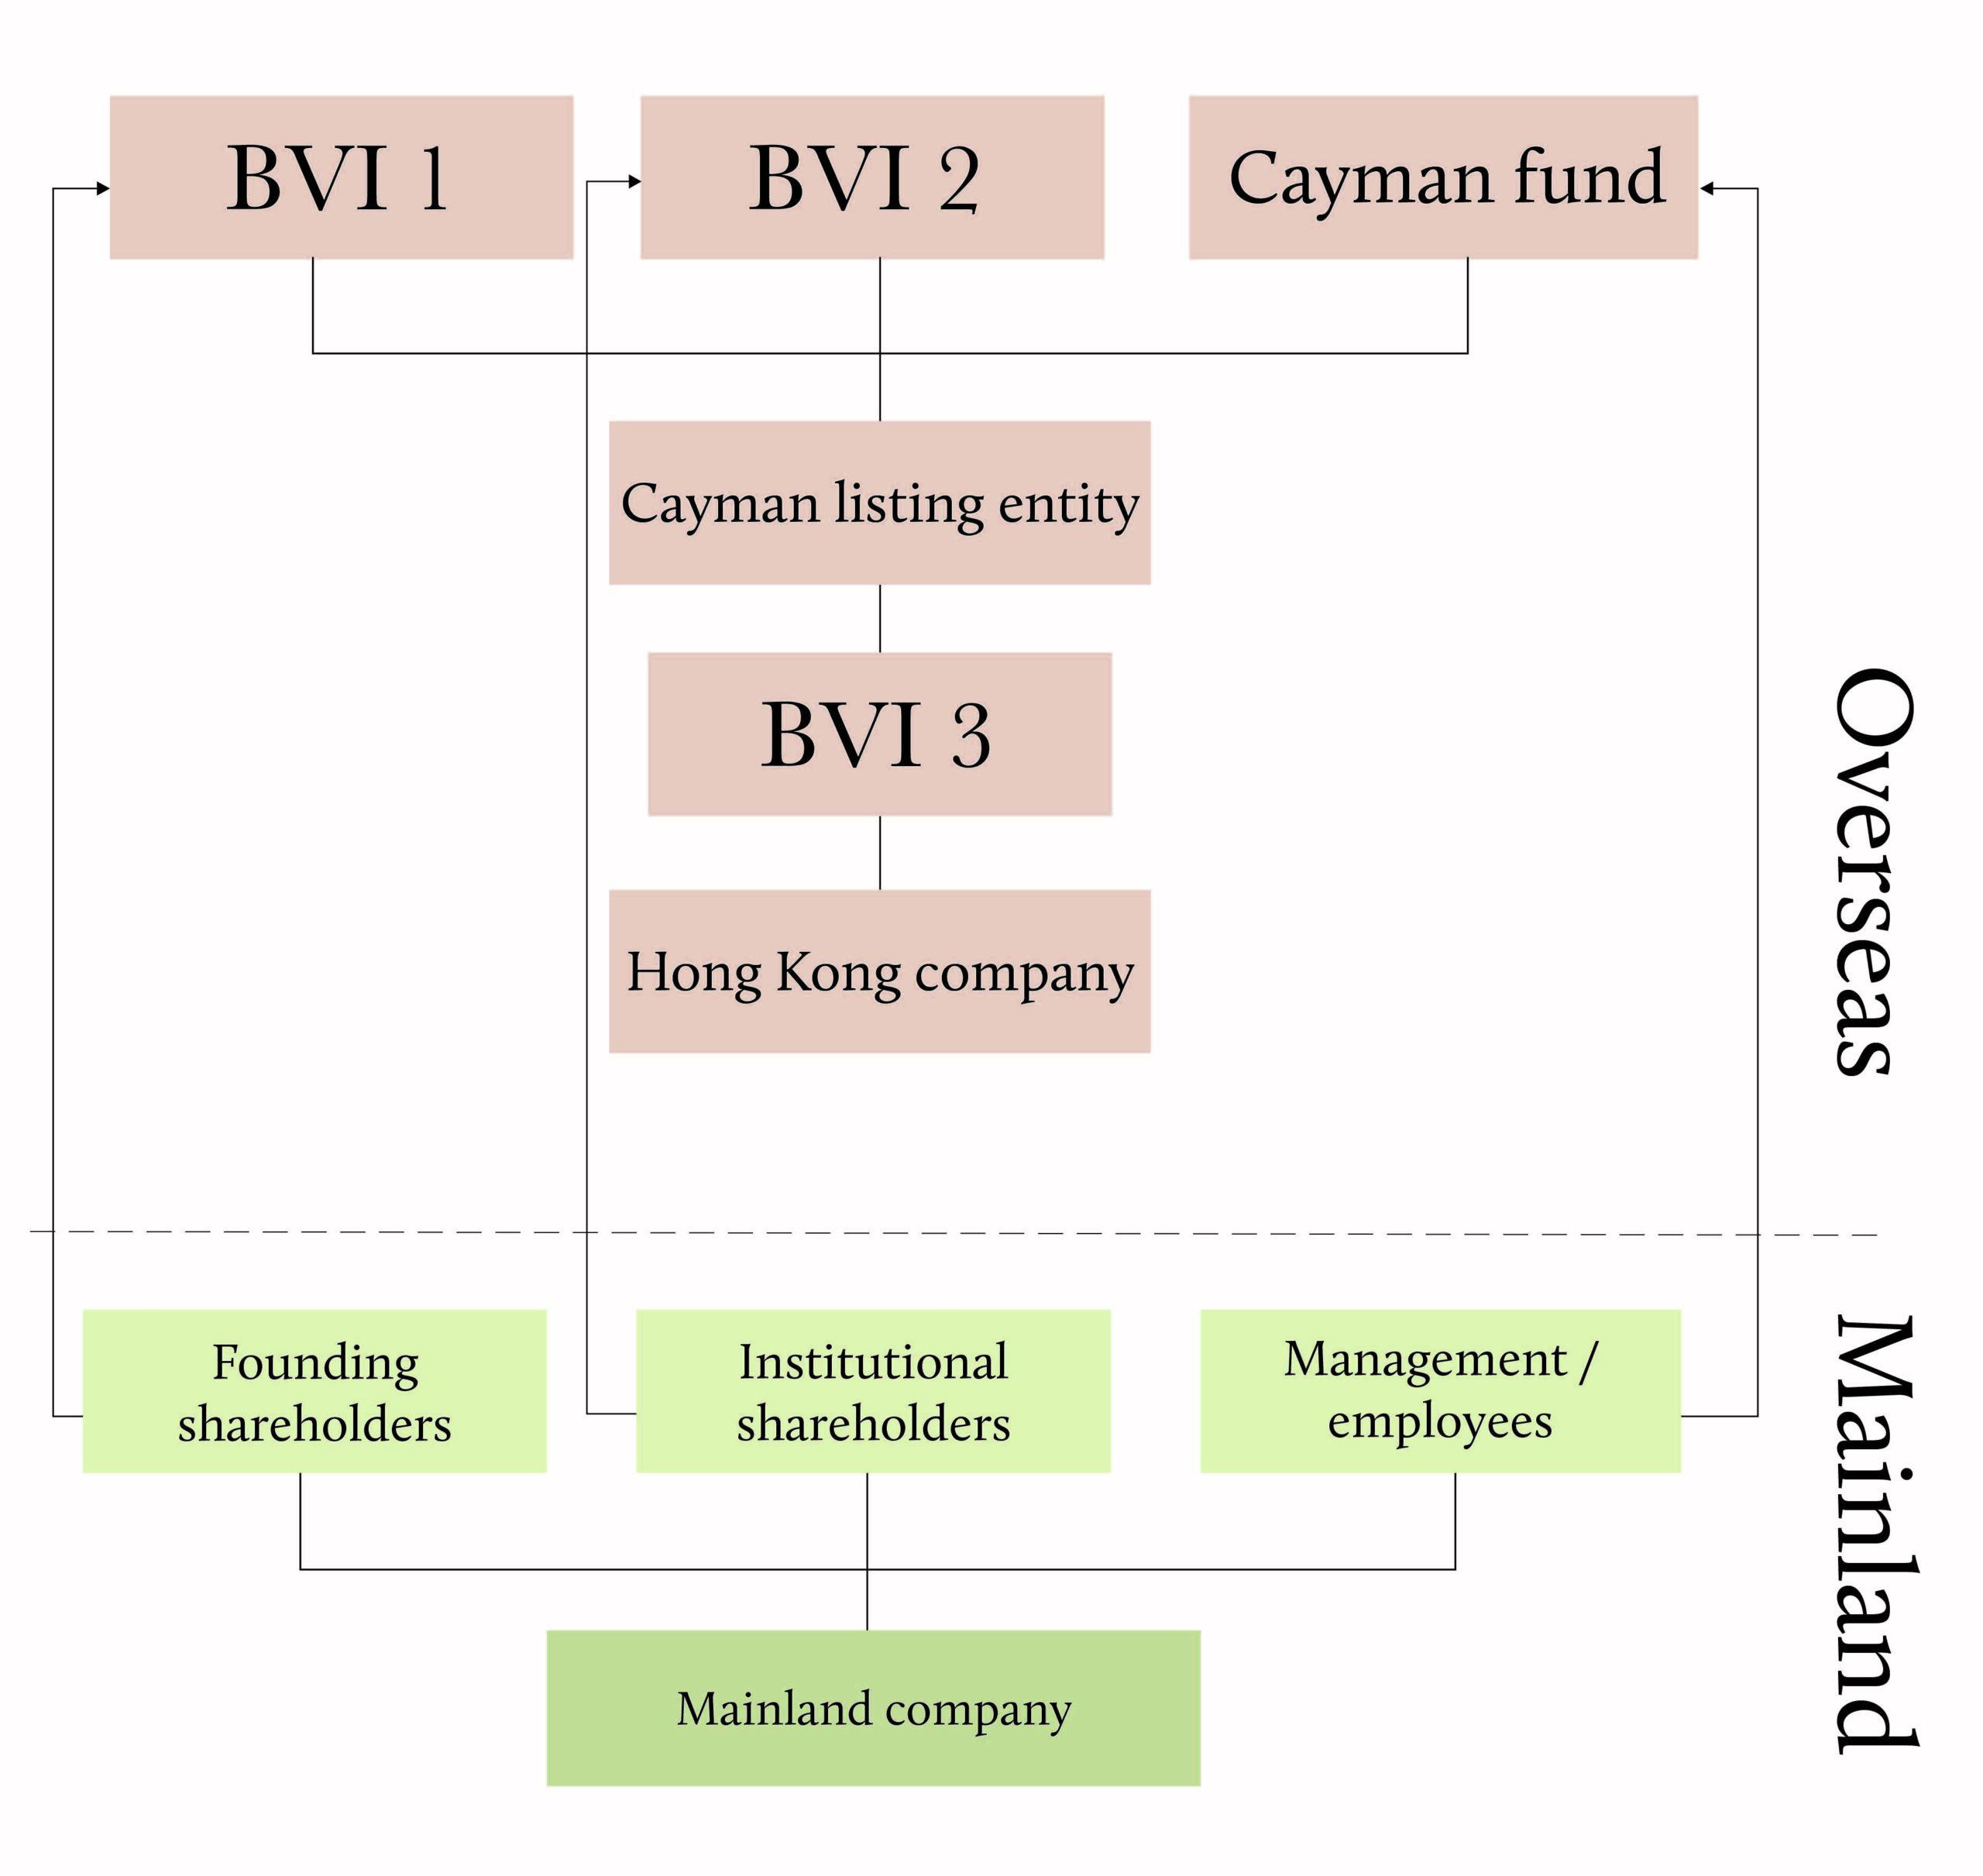 Overseas structure